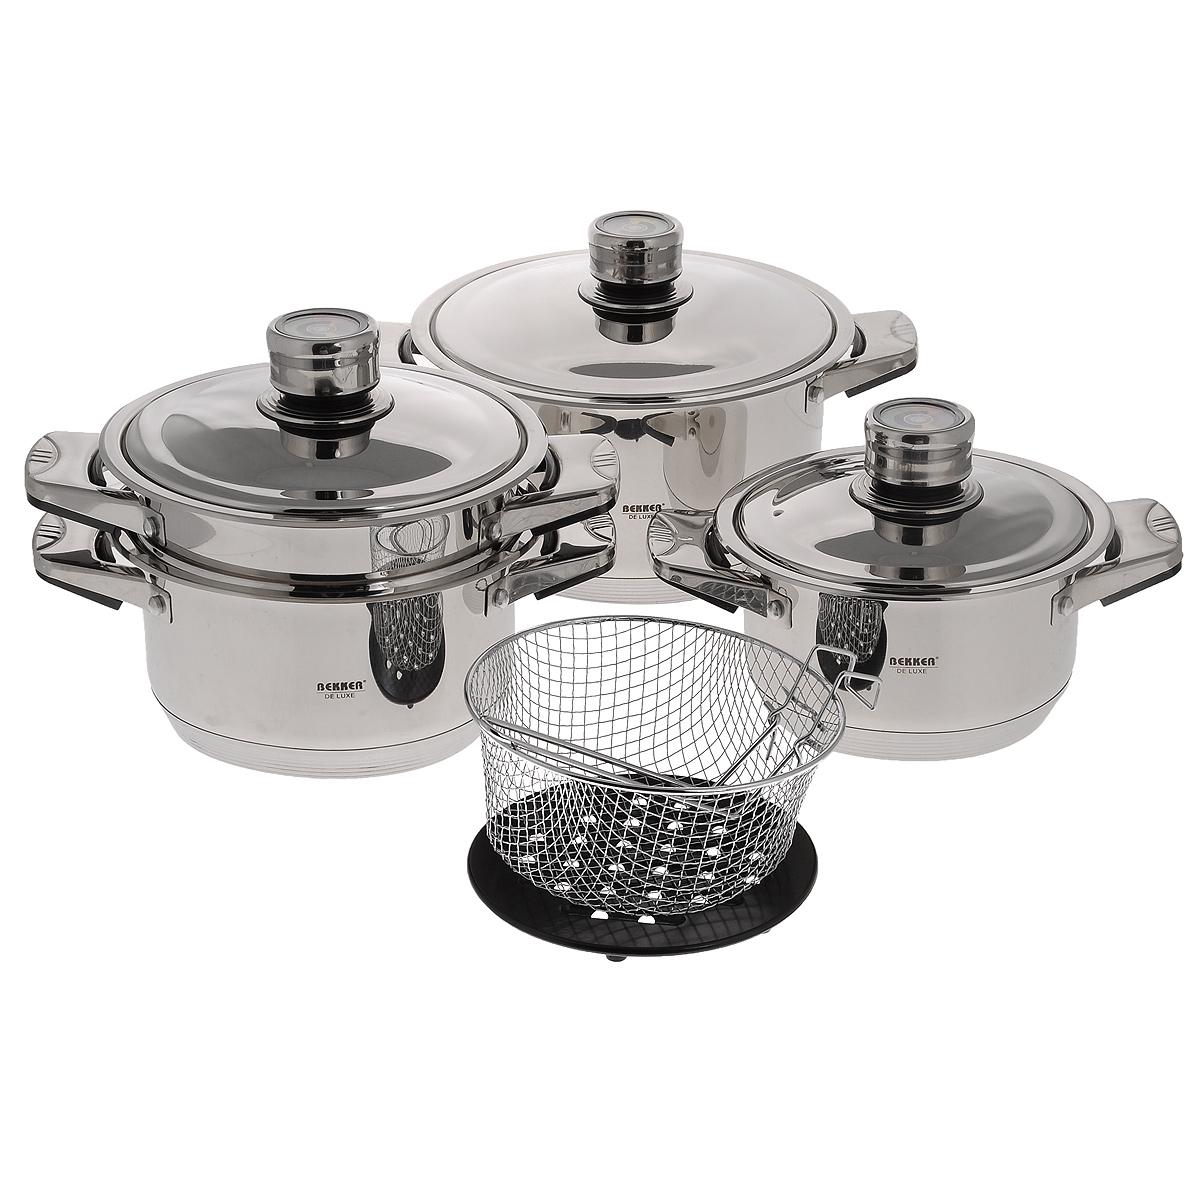 Набор посуды Bekker De Luxe, 9 предметов. BK-2865